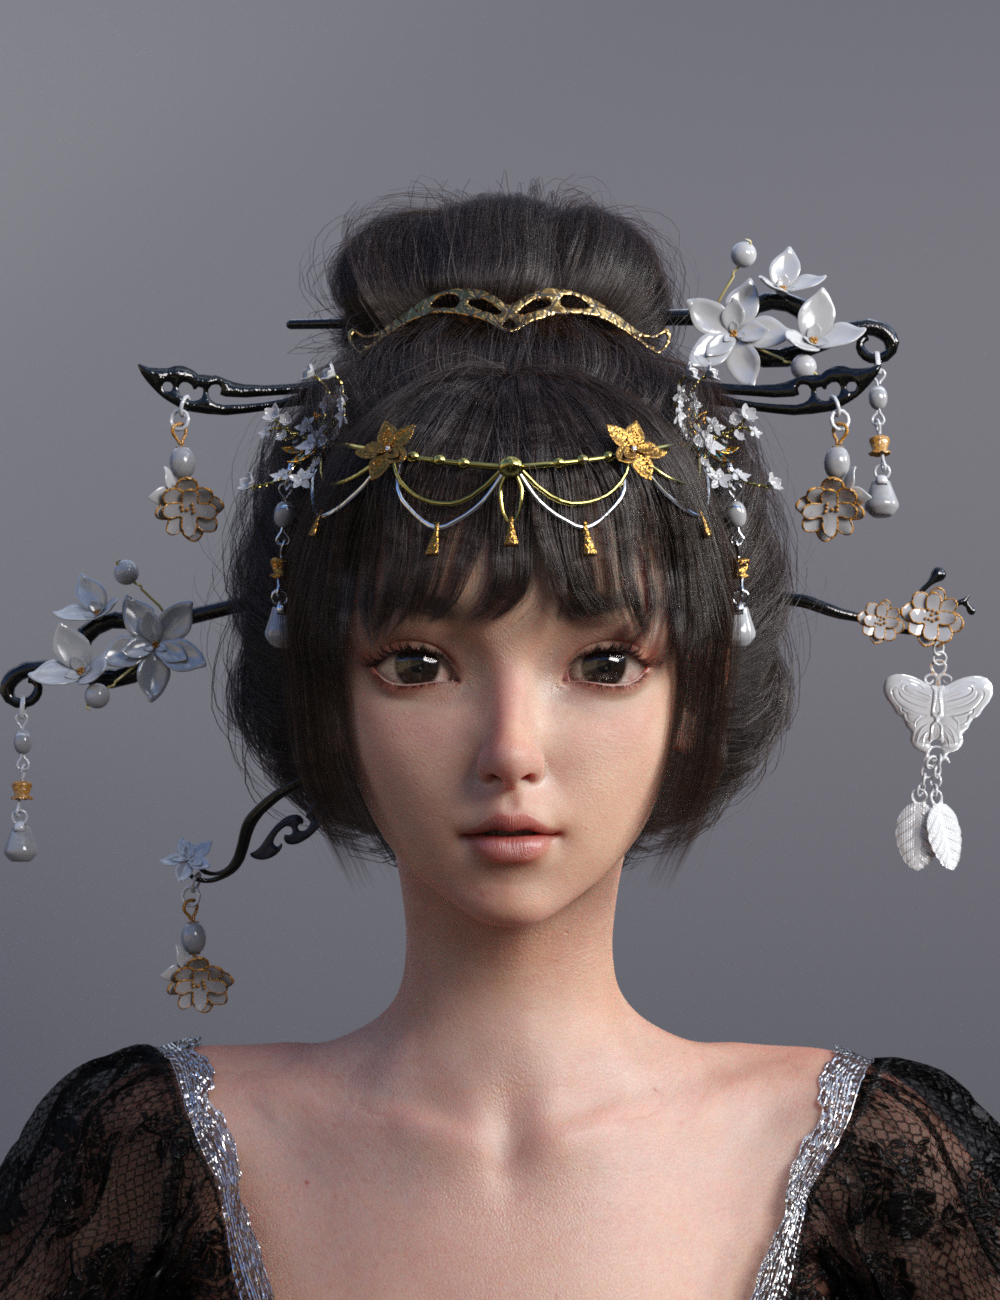 Luoqu for Genesis 8.1 Female by: Ergou, 3D Models by Daz 3D